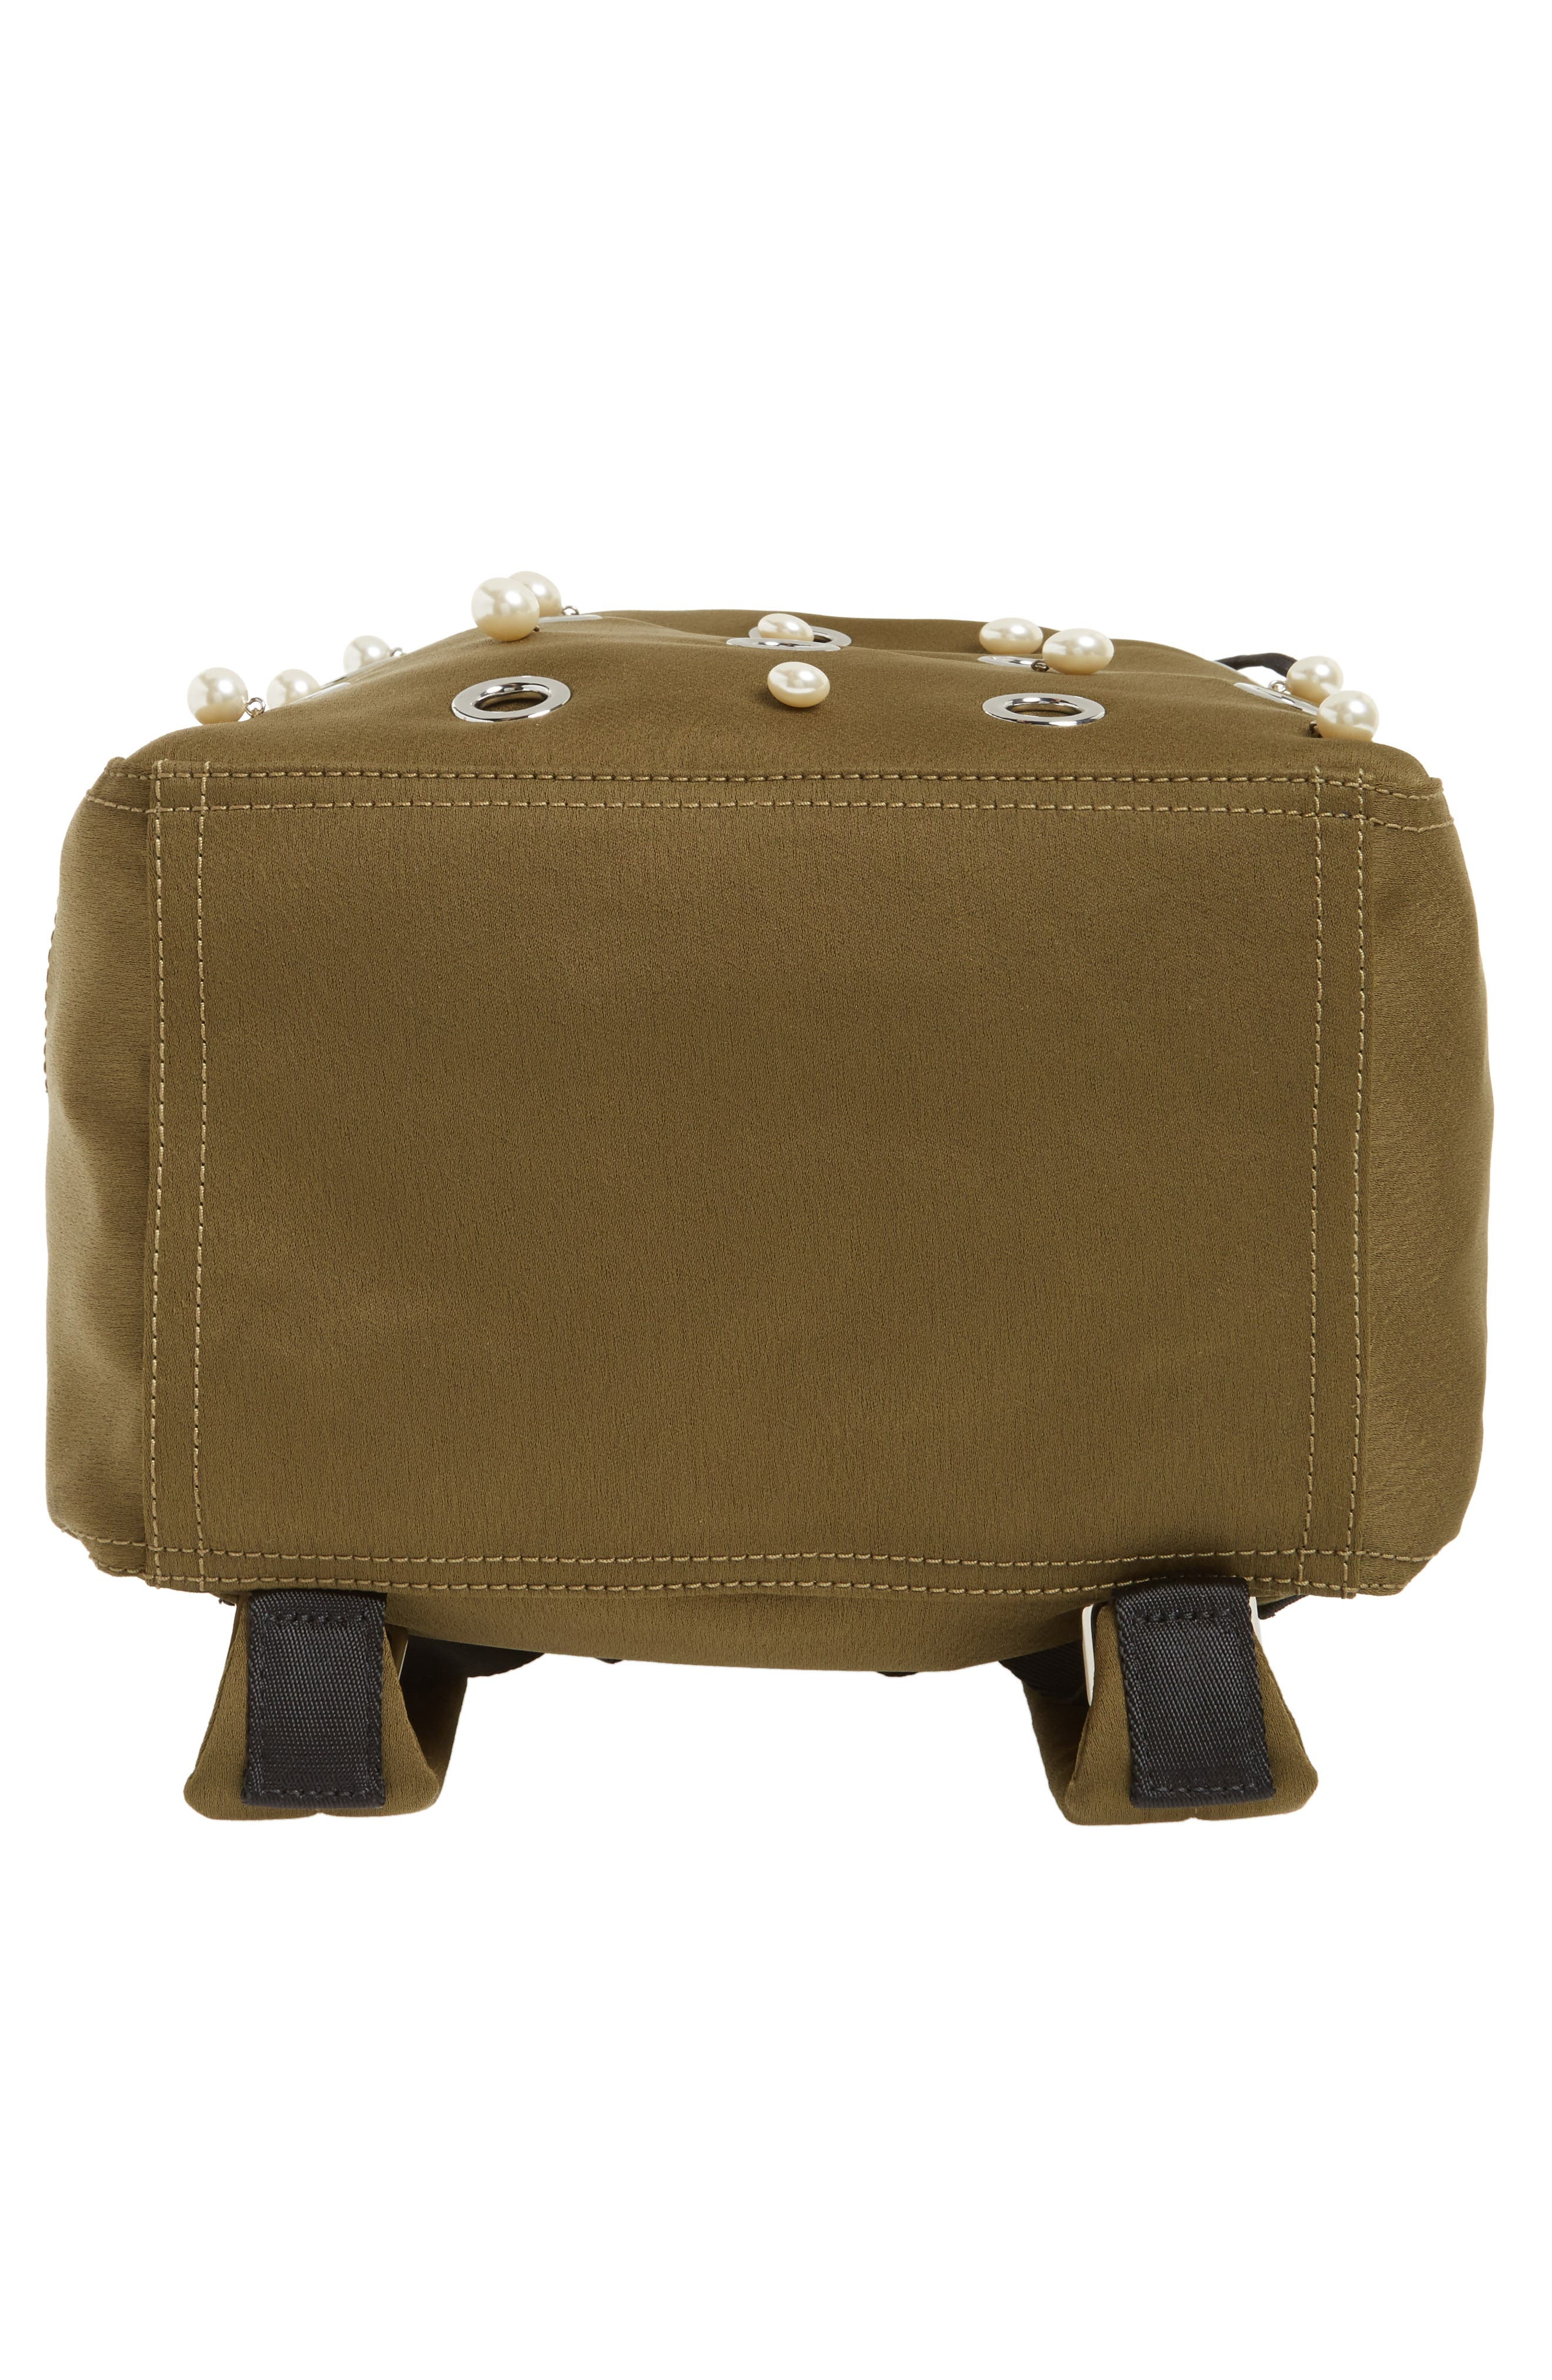 Phillip Lim 3.1 Medium Go-Go Embellished Backpack,                             Alternate thumbnail 11, color,